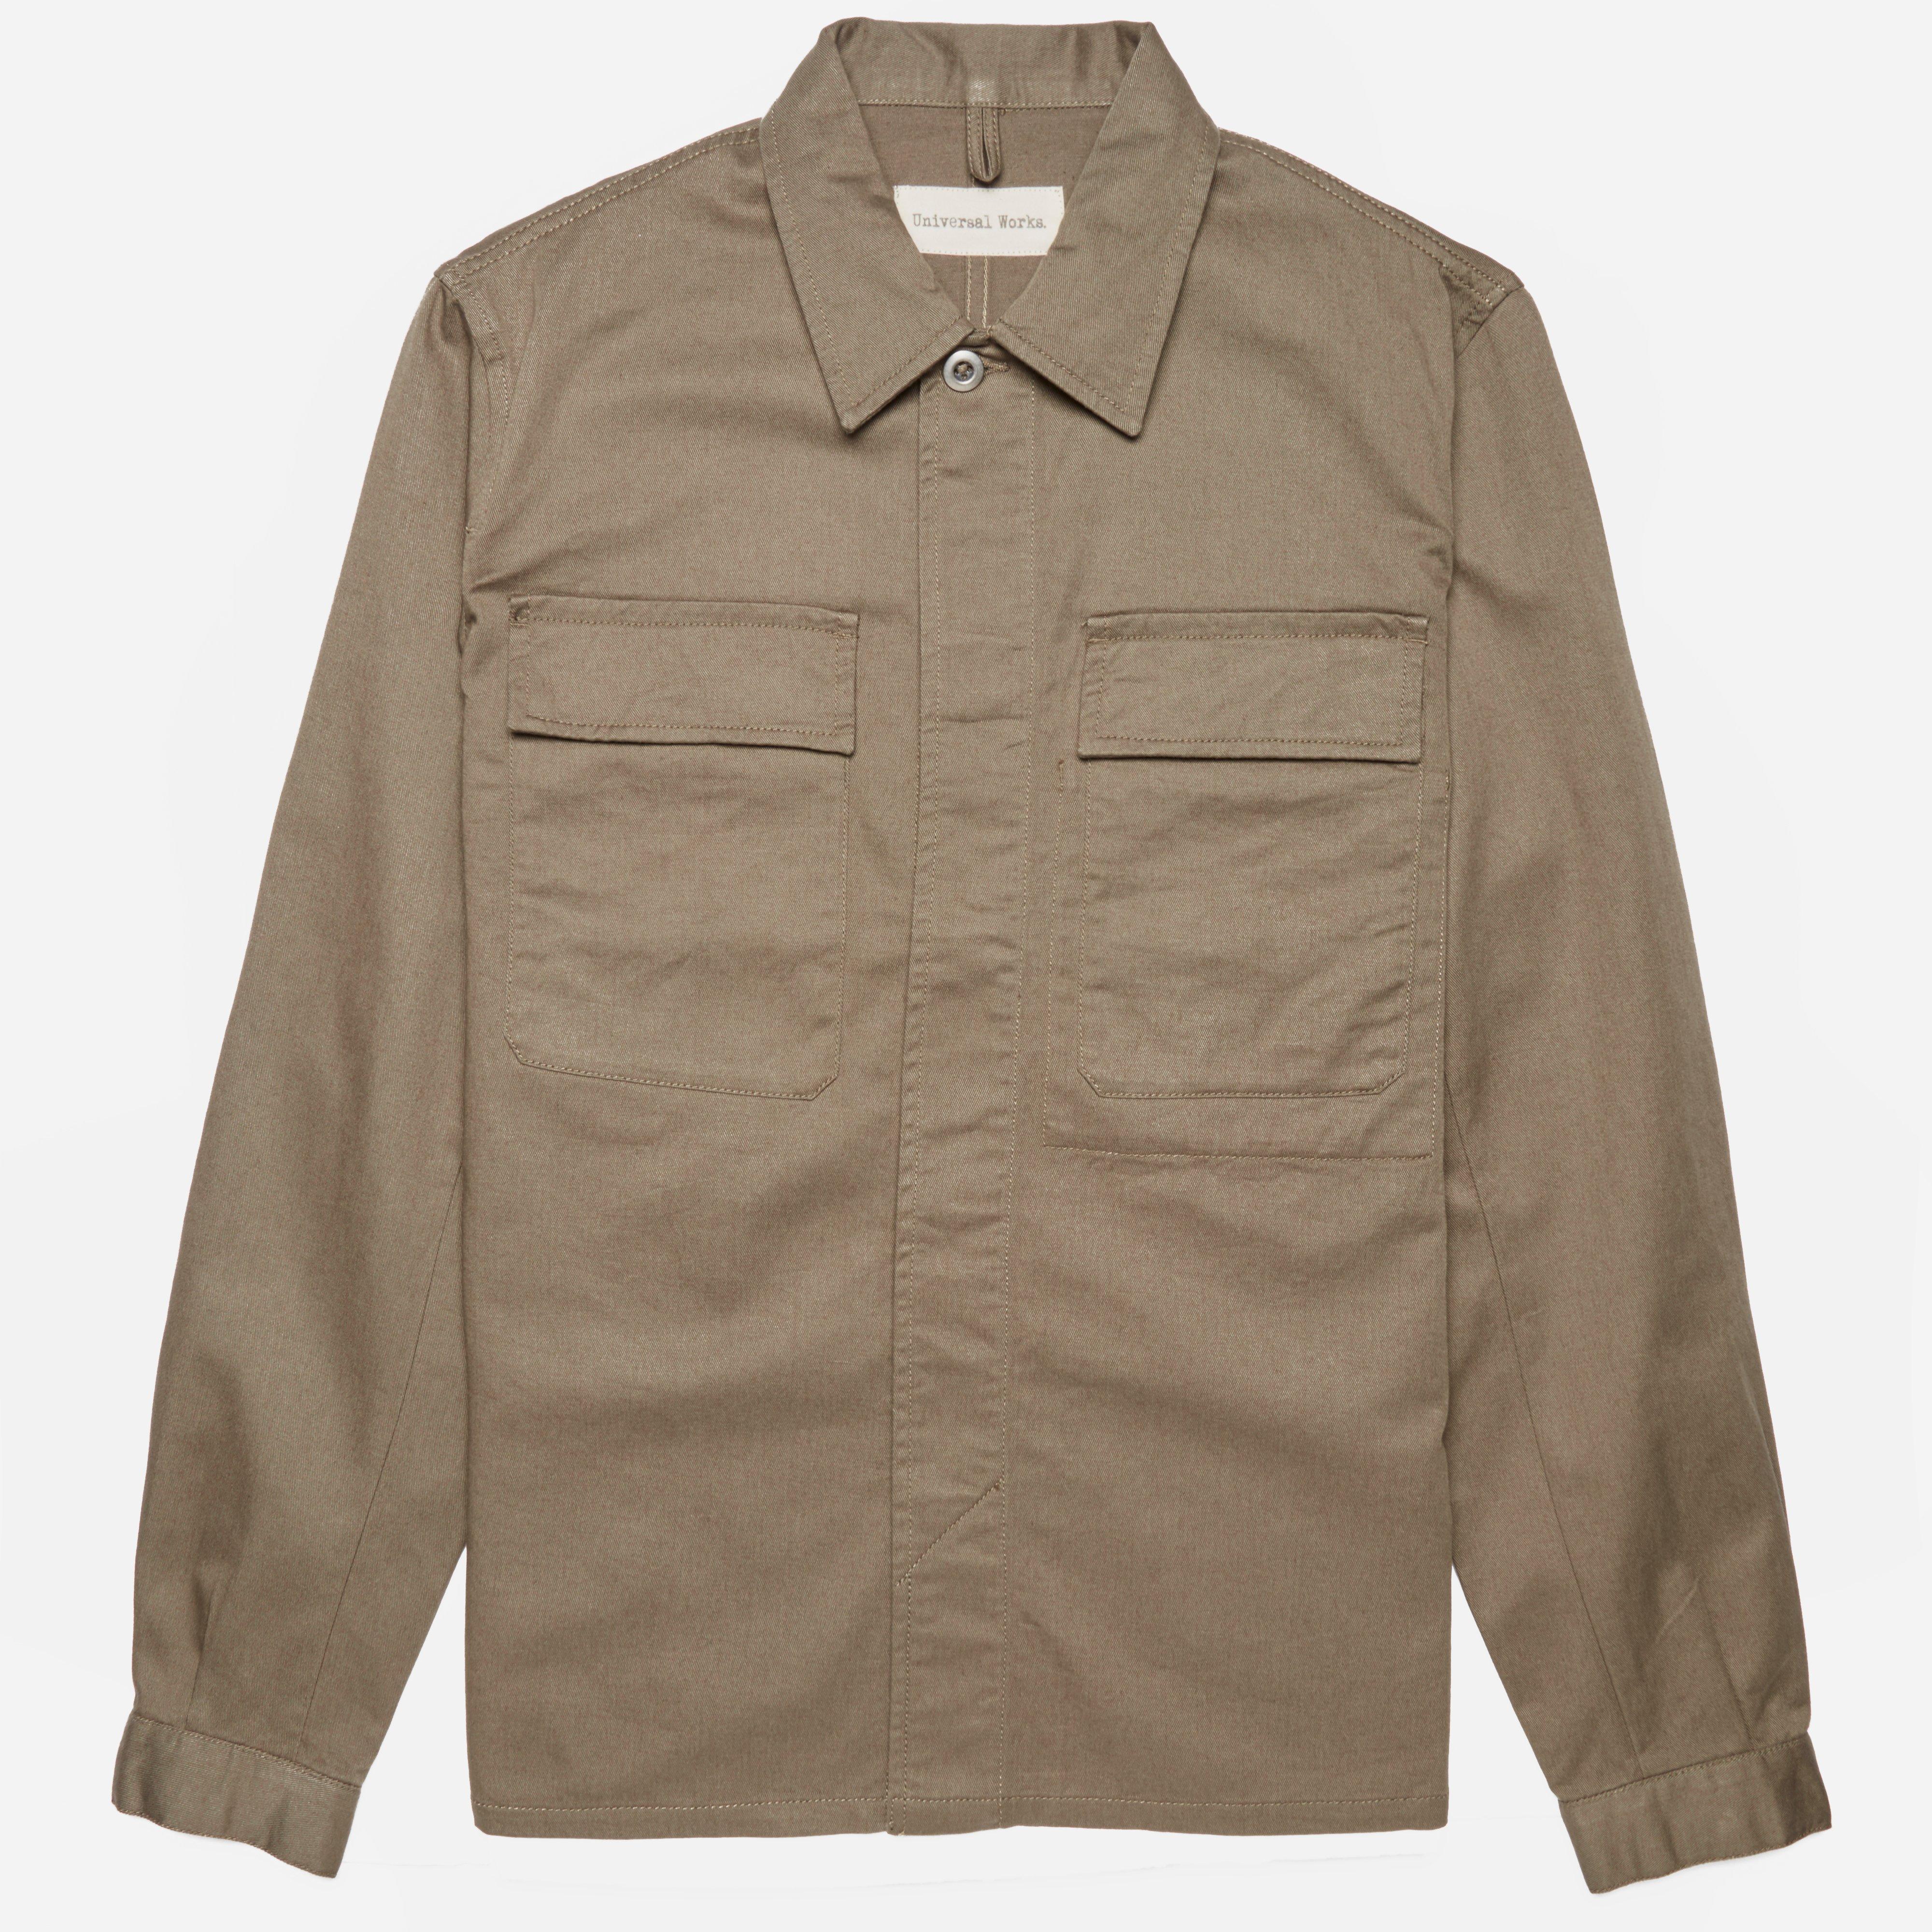 Universal Works Twill Military Work Shirt